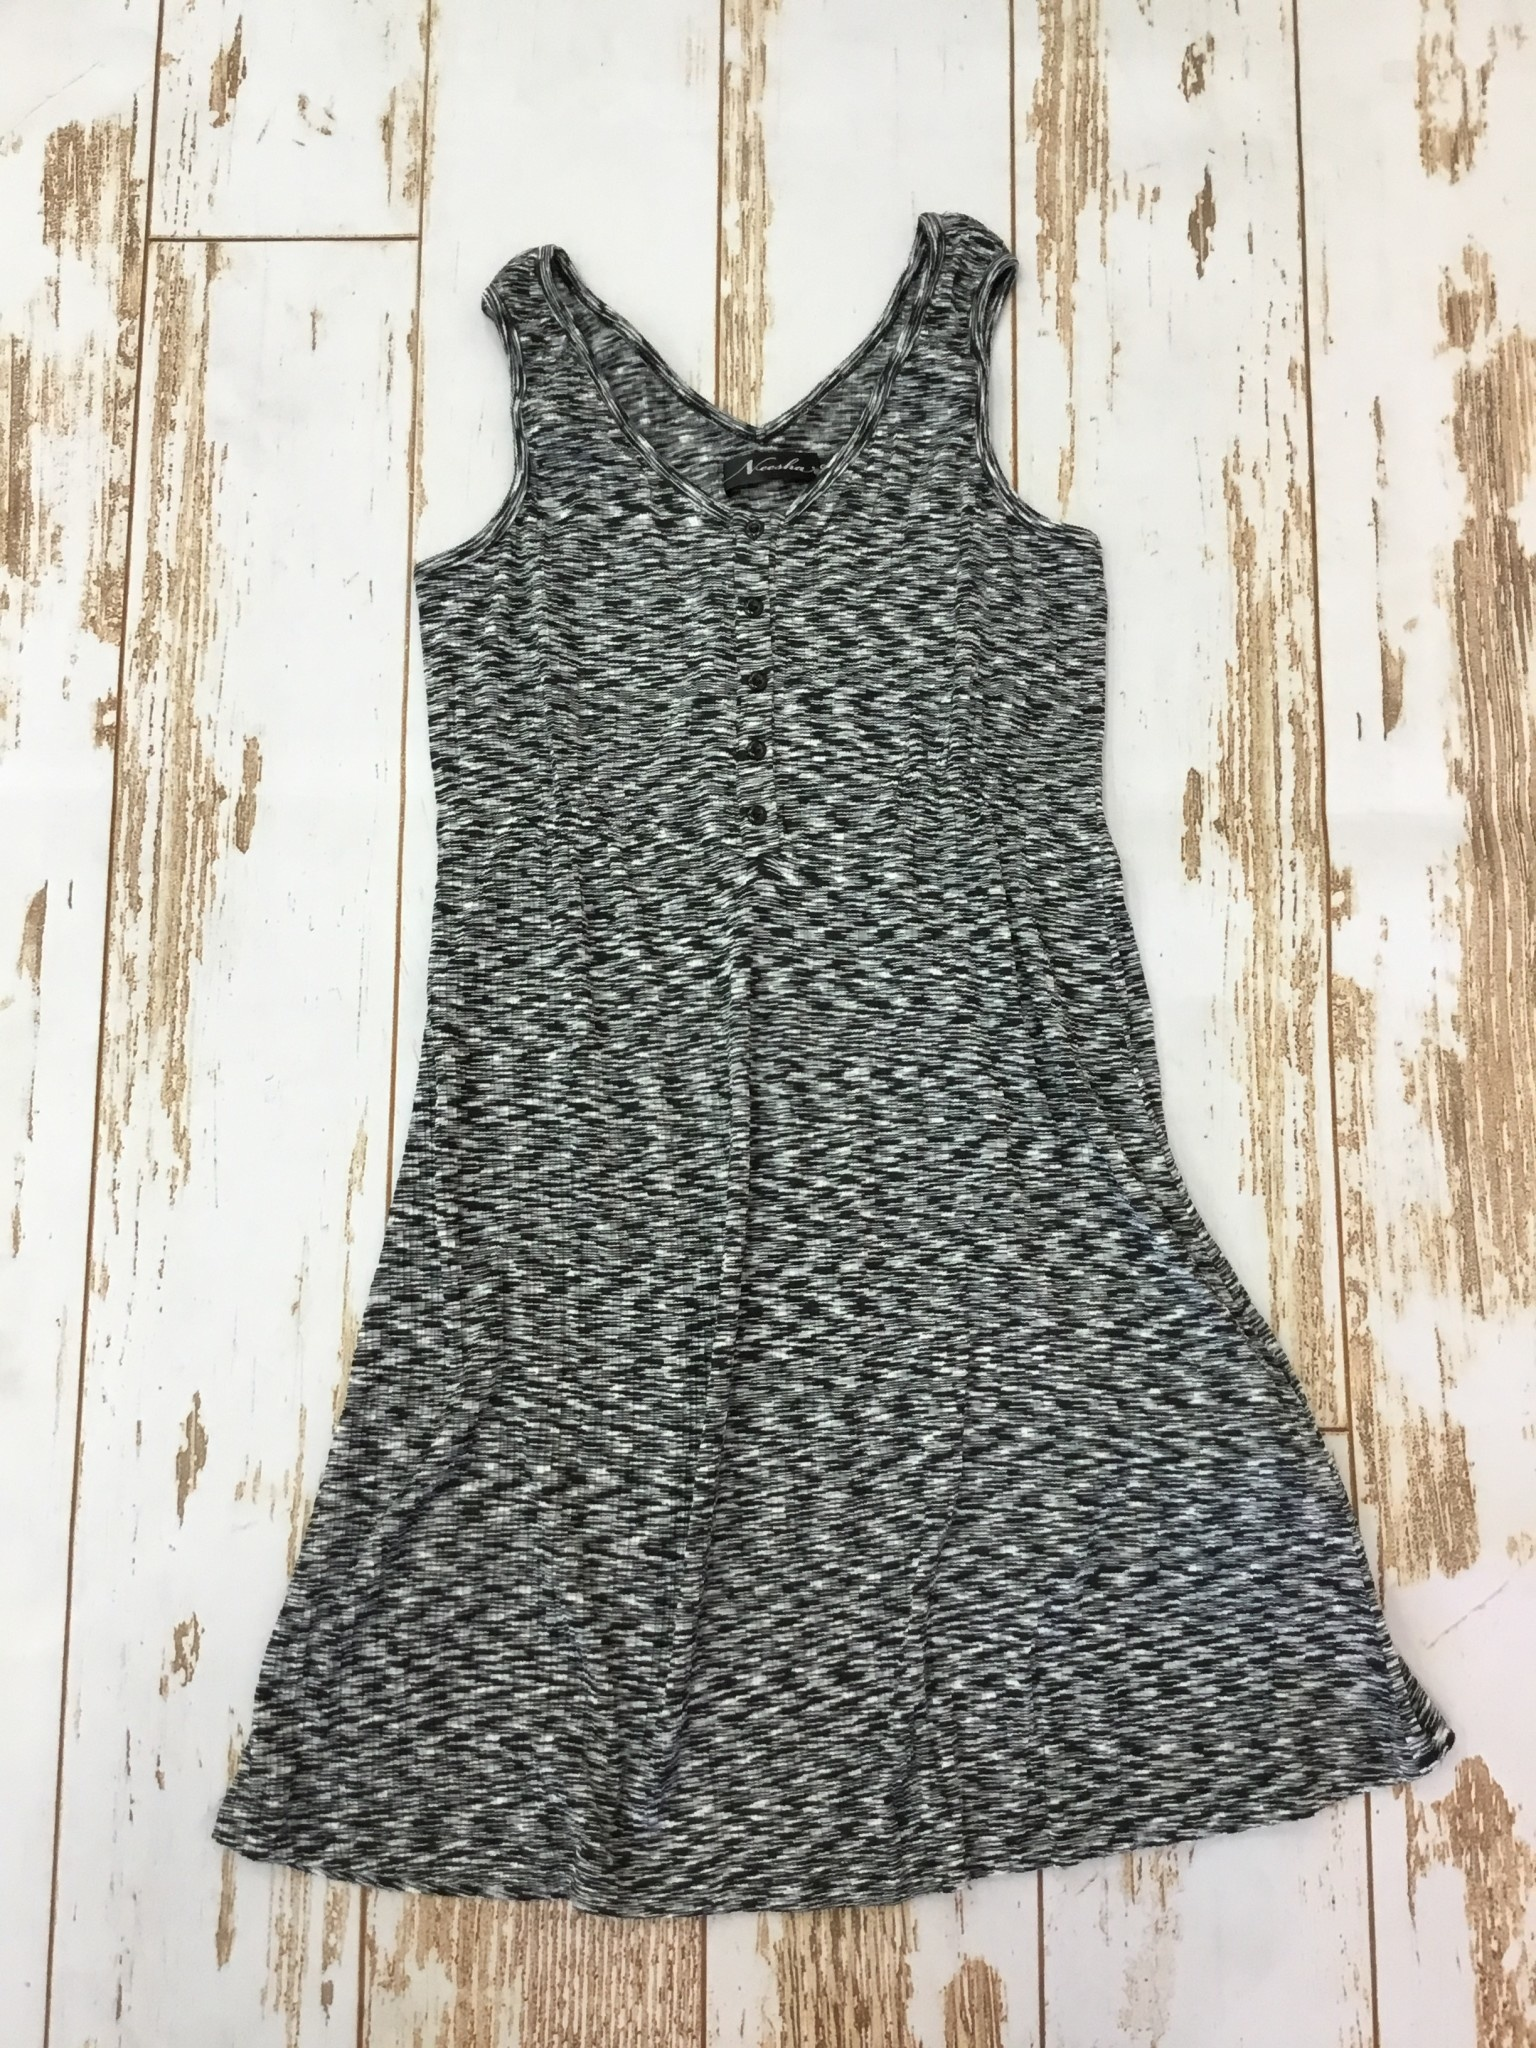 Neesha Athleisure Crinkle Smocked Button Dress in Black